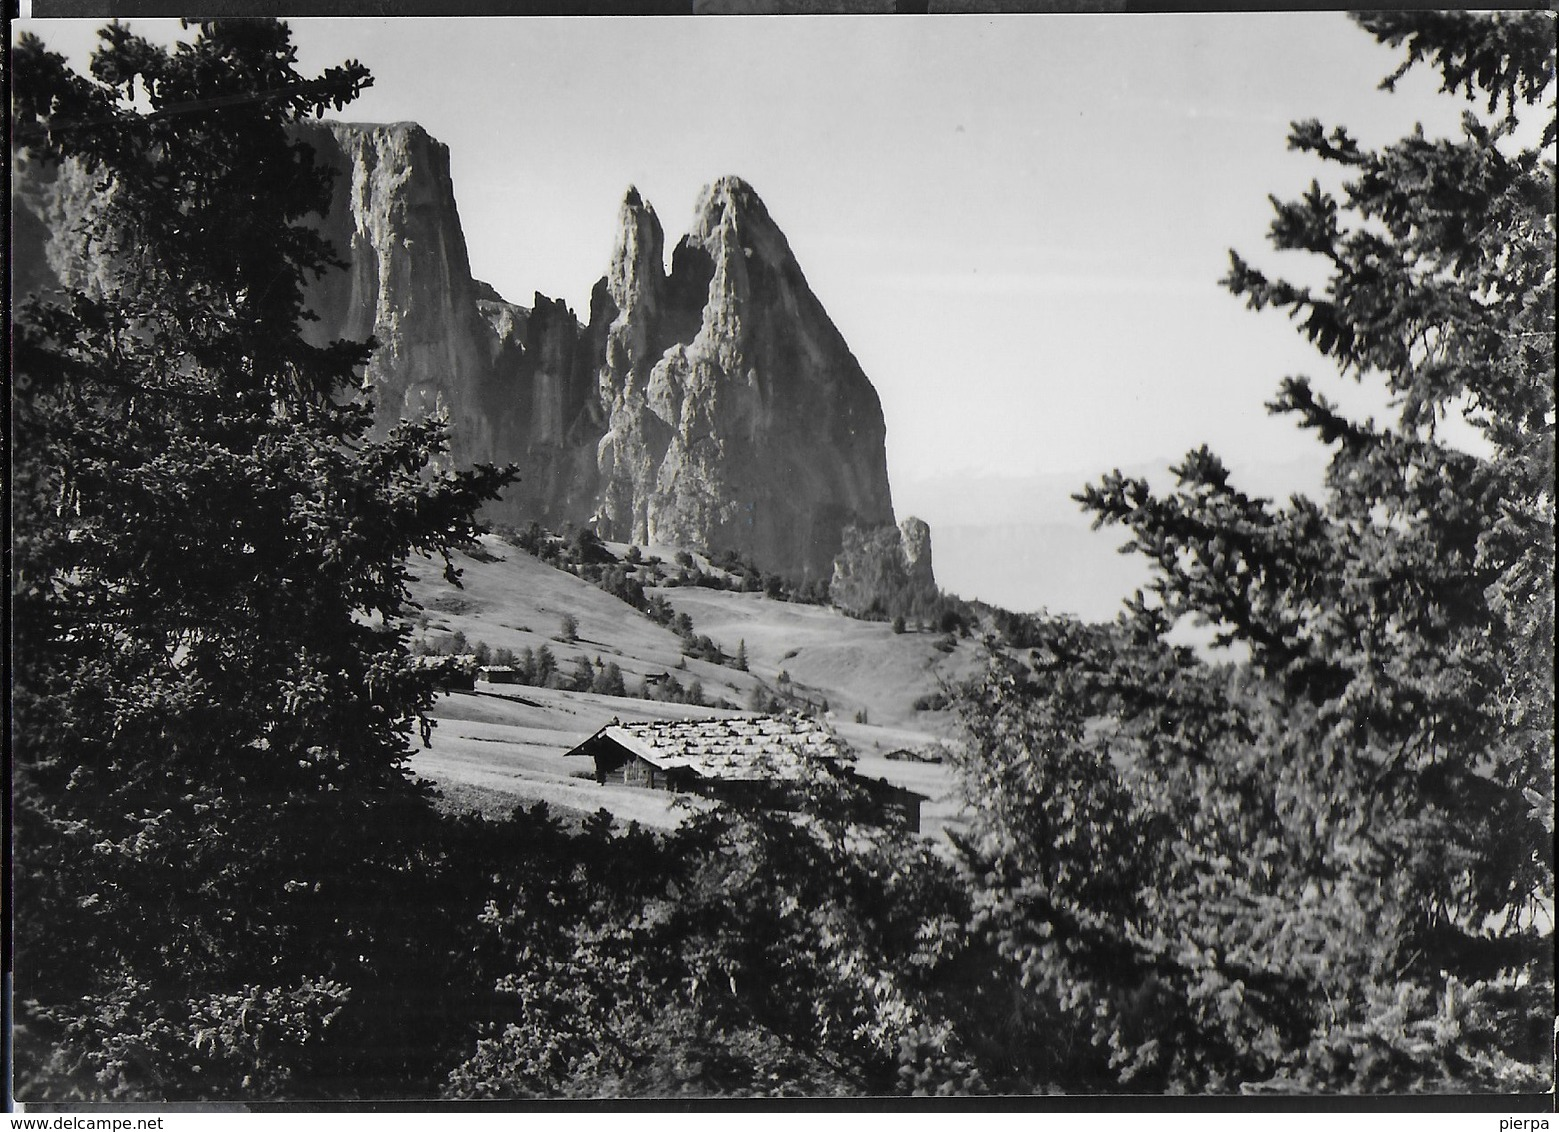 DOLOMITI - ALPE DI SIUSI - LO SCILIAR - FOTOEDIZ. GHEDINA - NUOVA - Alpinisme